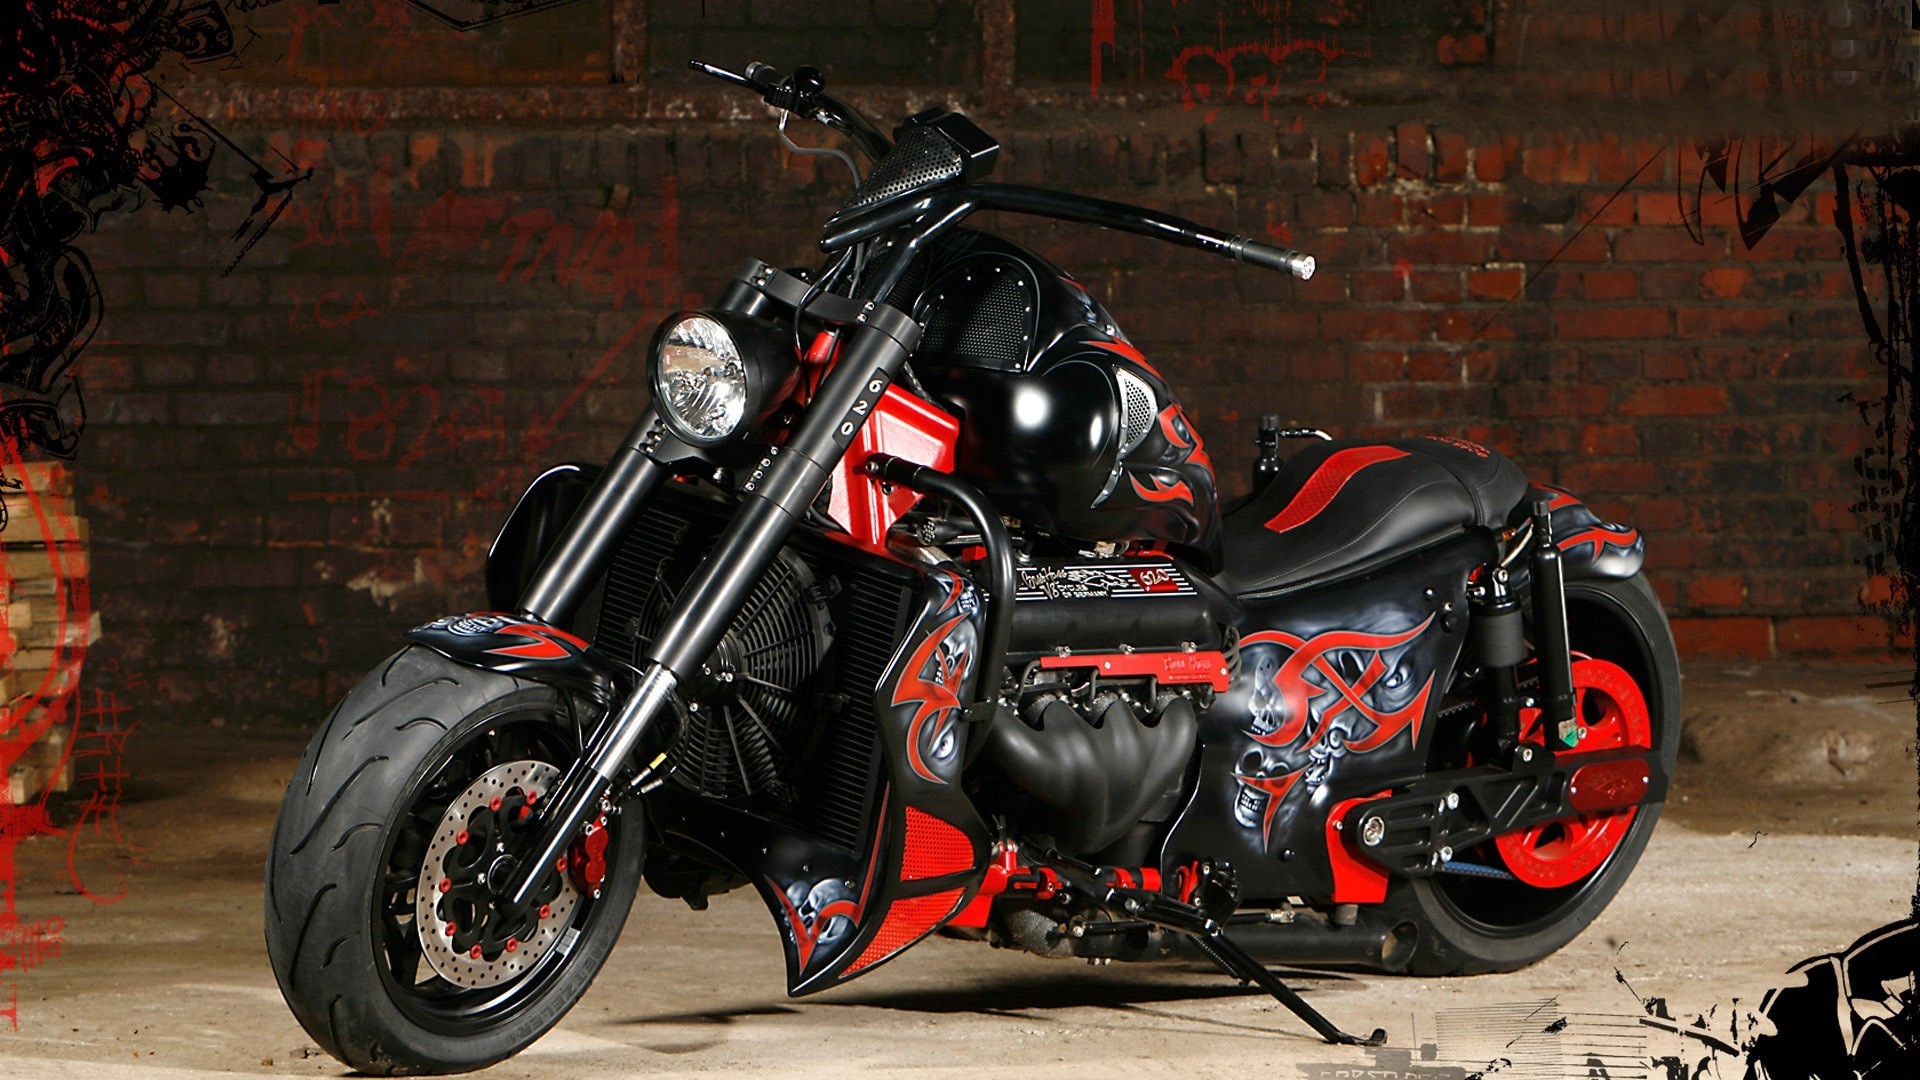 HD Harley Davidson Wallpapers (77+ images)